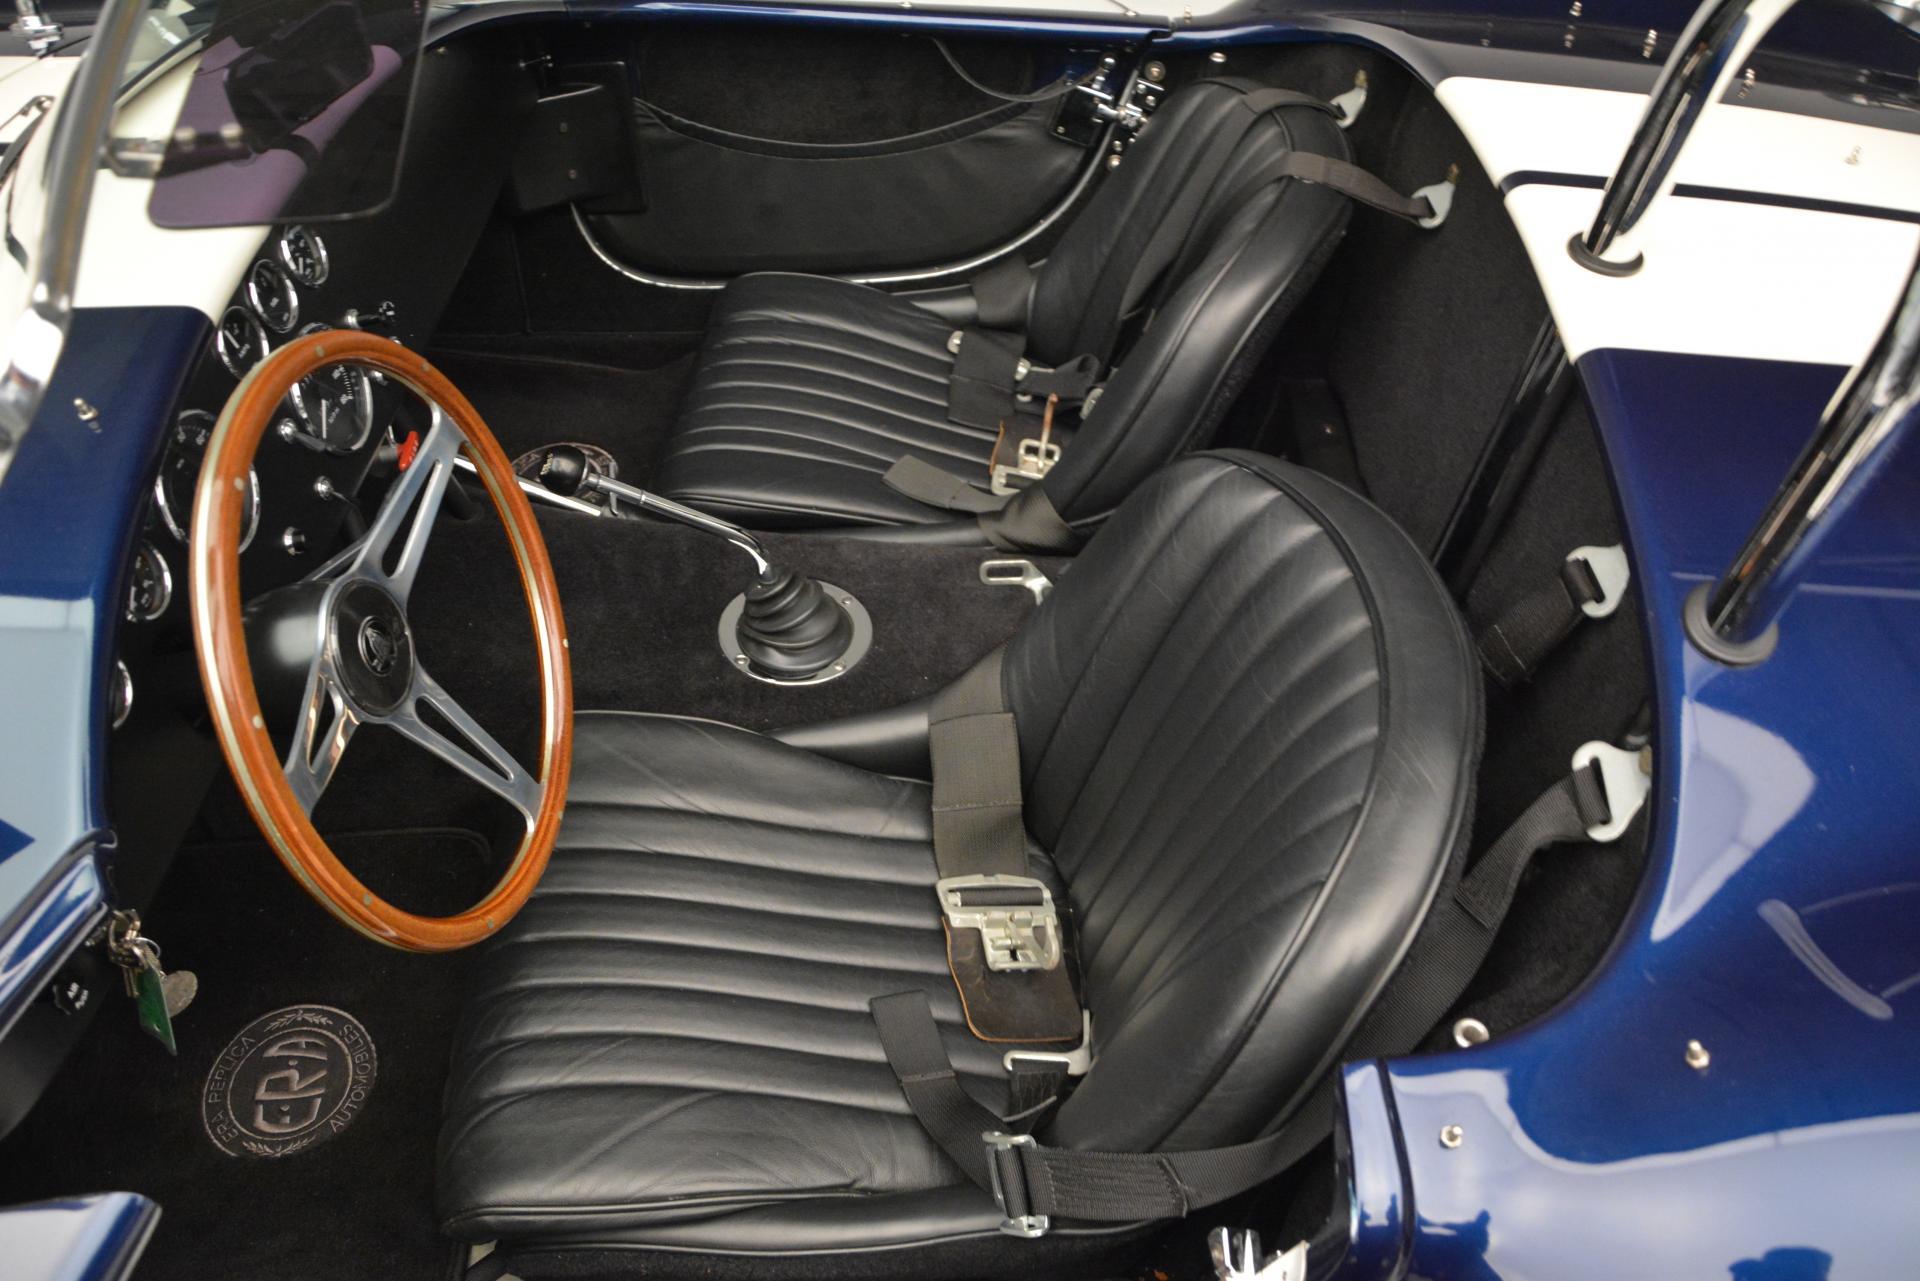 Used 2006 Ford ERA 427 SC  For Sale In Greenwich, CT. Alfa Romeo of Greenwich, 7051 107_p12